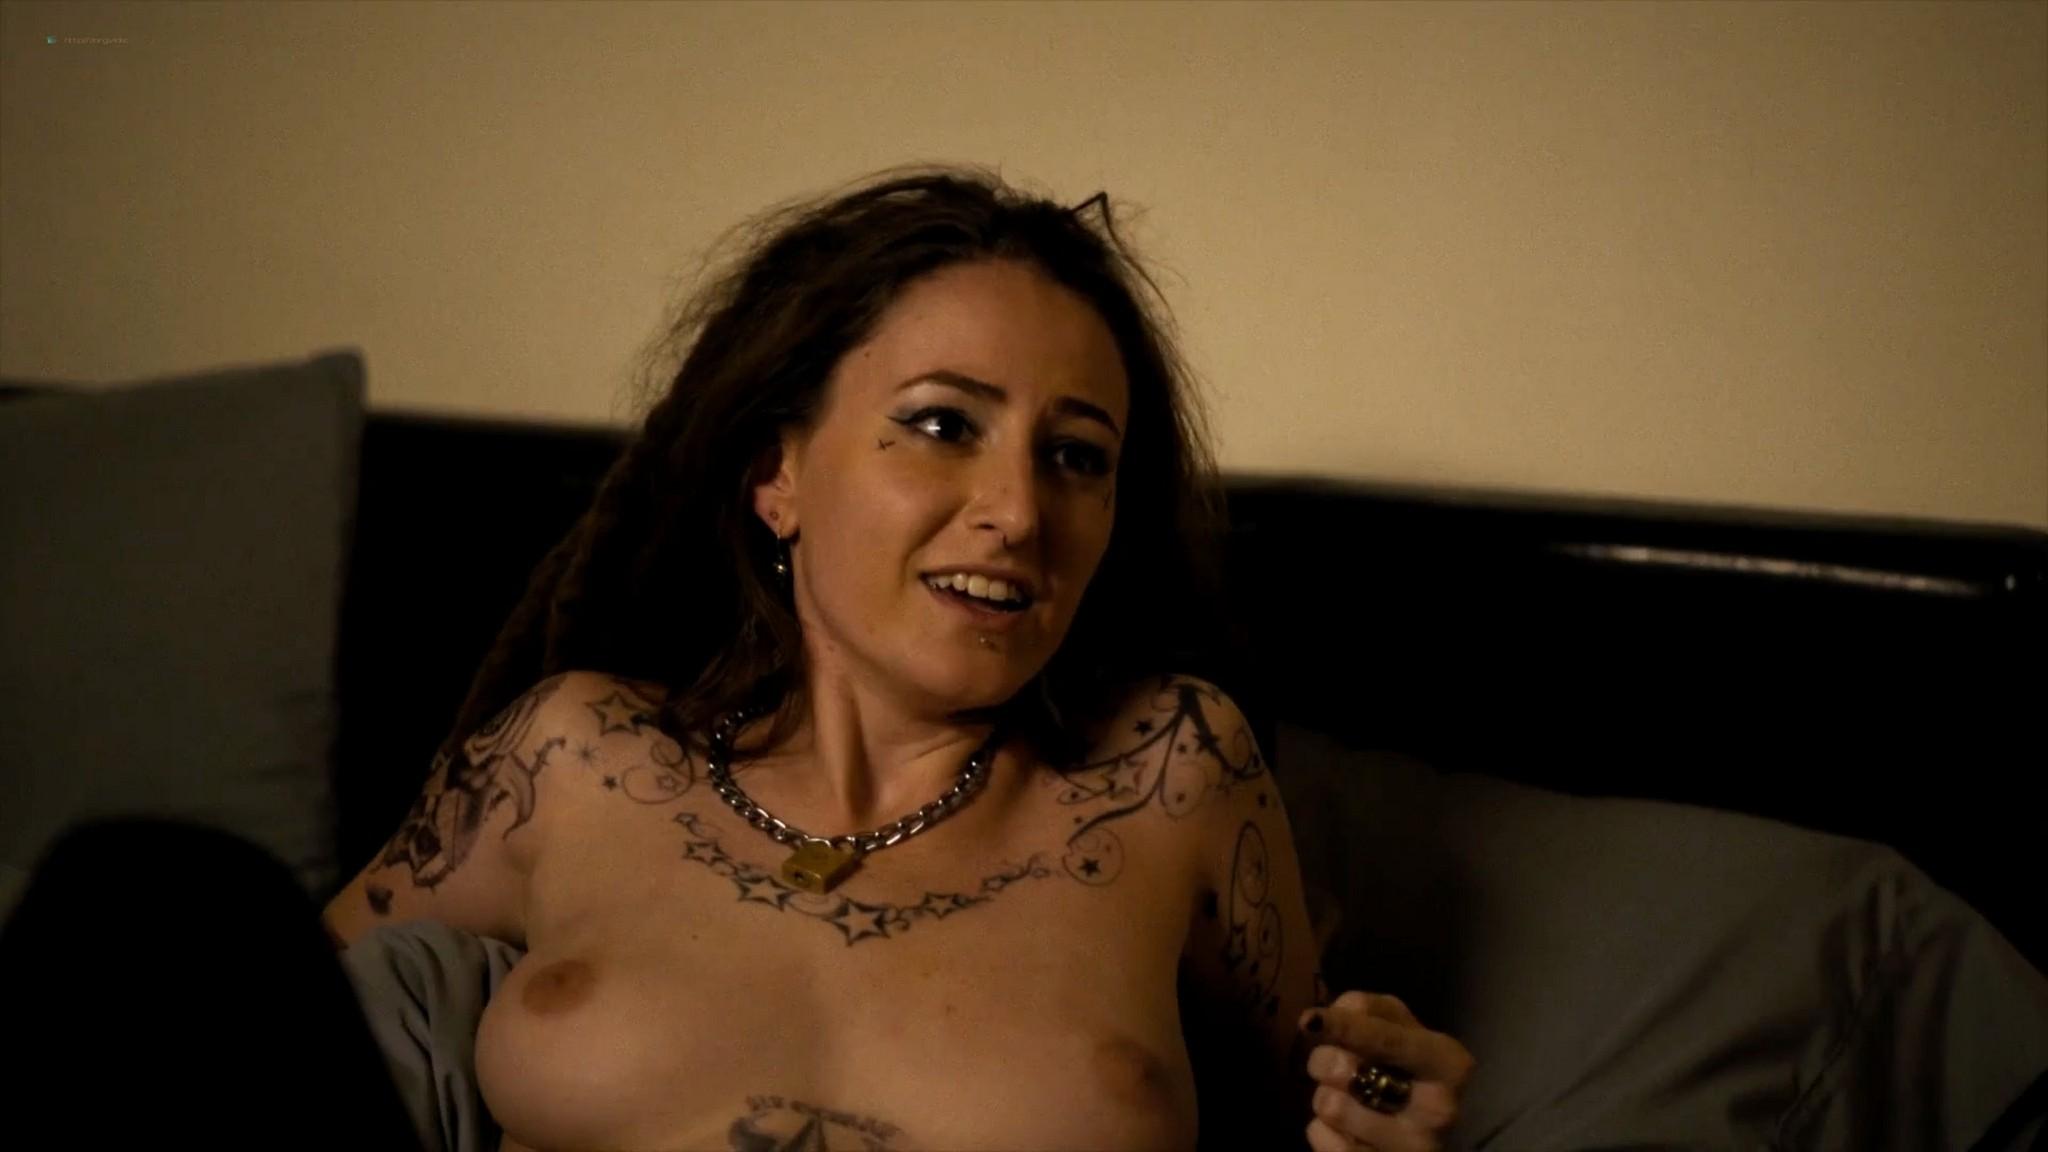 Sadie Katz nude lesbian sex with Victoria De Mare - Hanukkah (2019) HD 1080p Web (13)